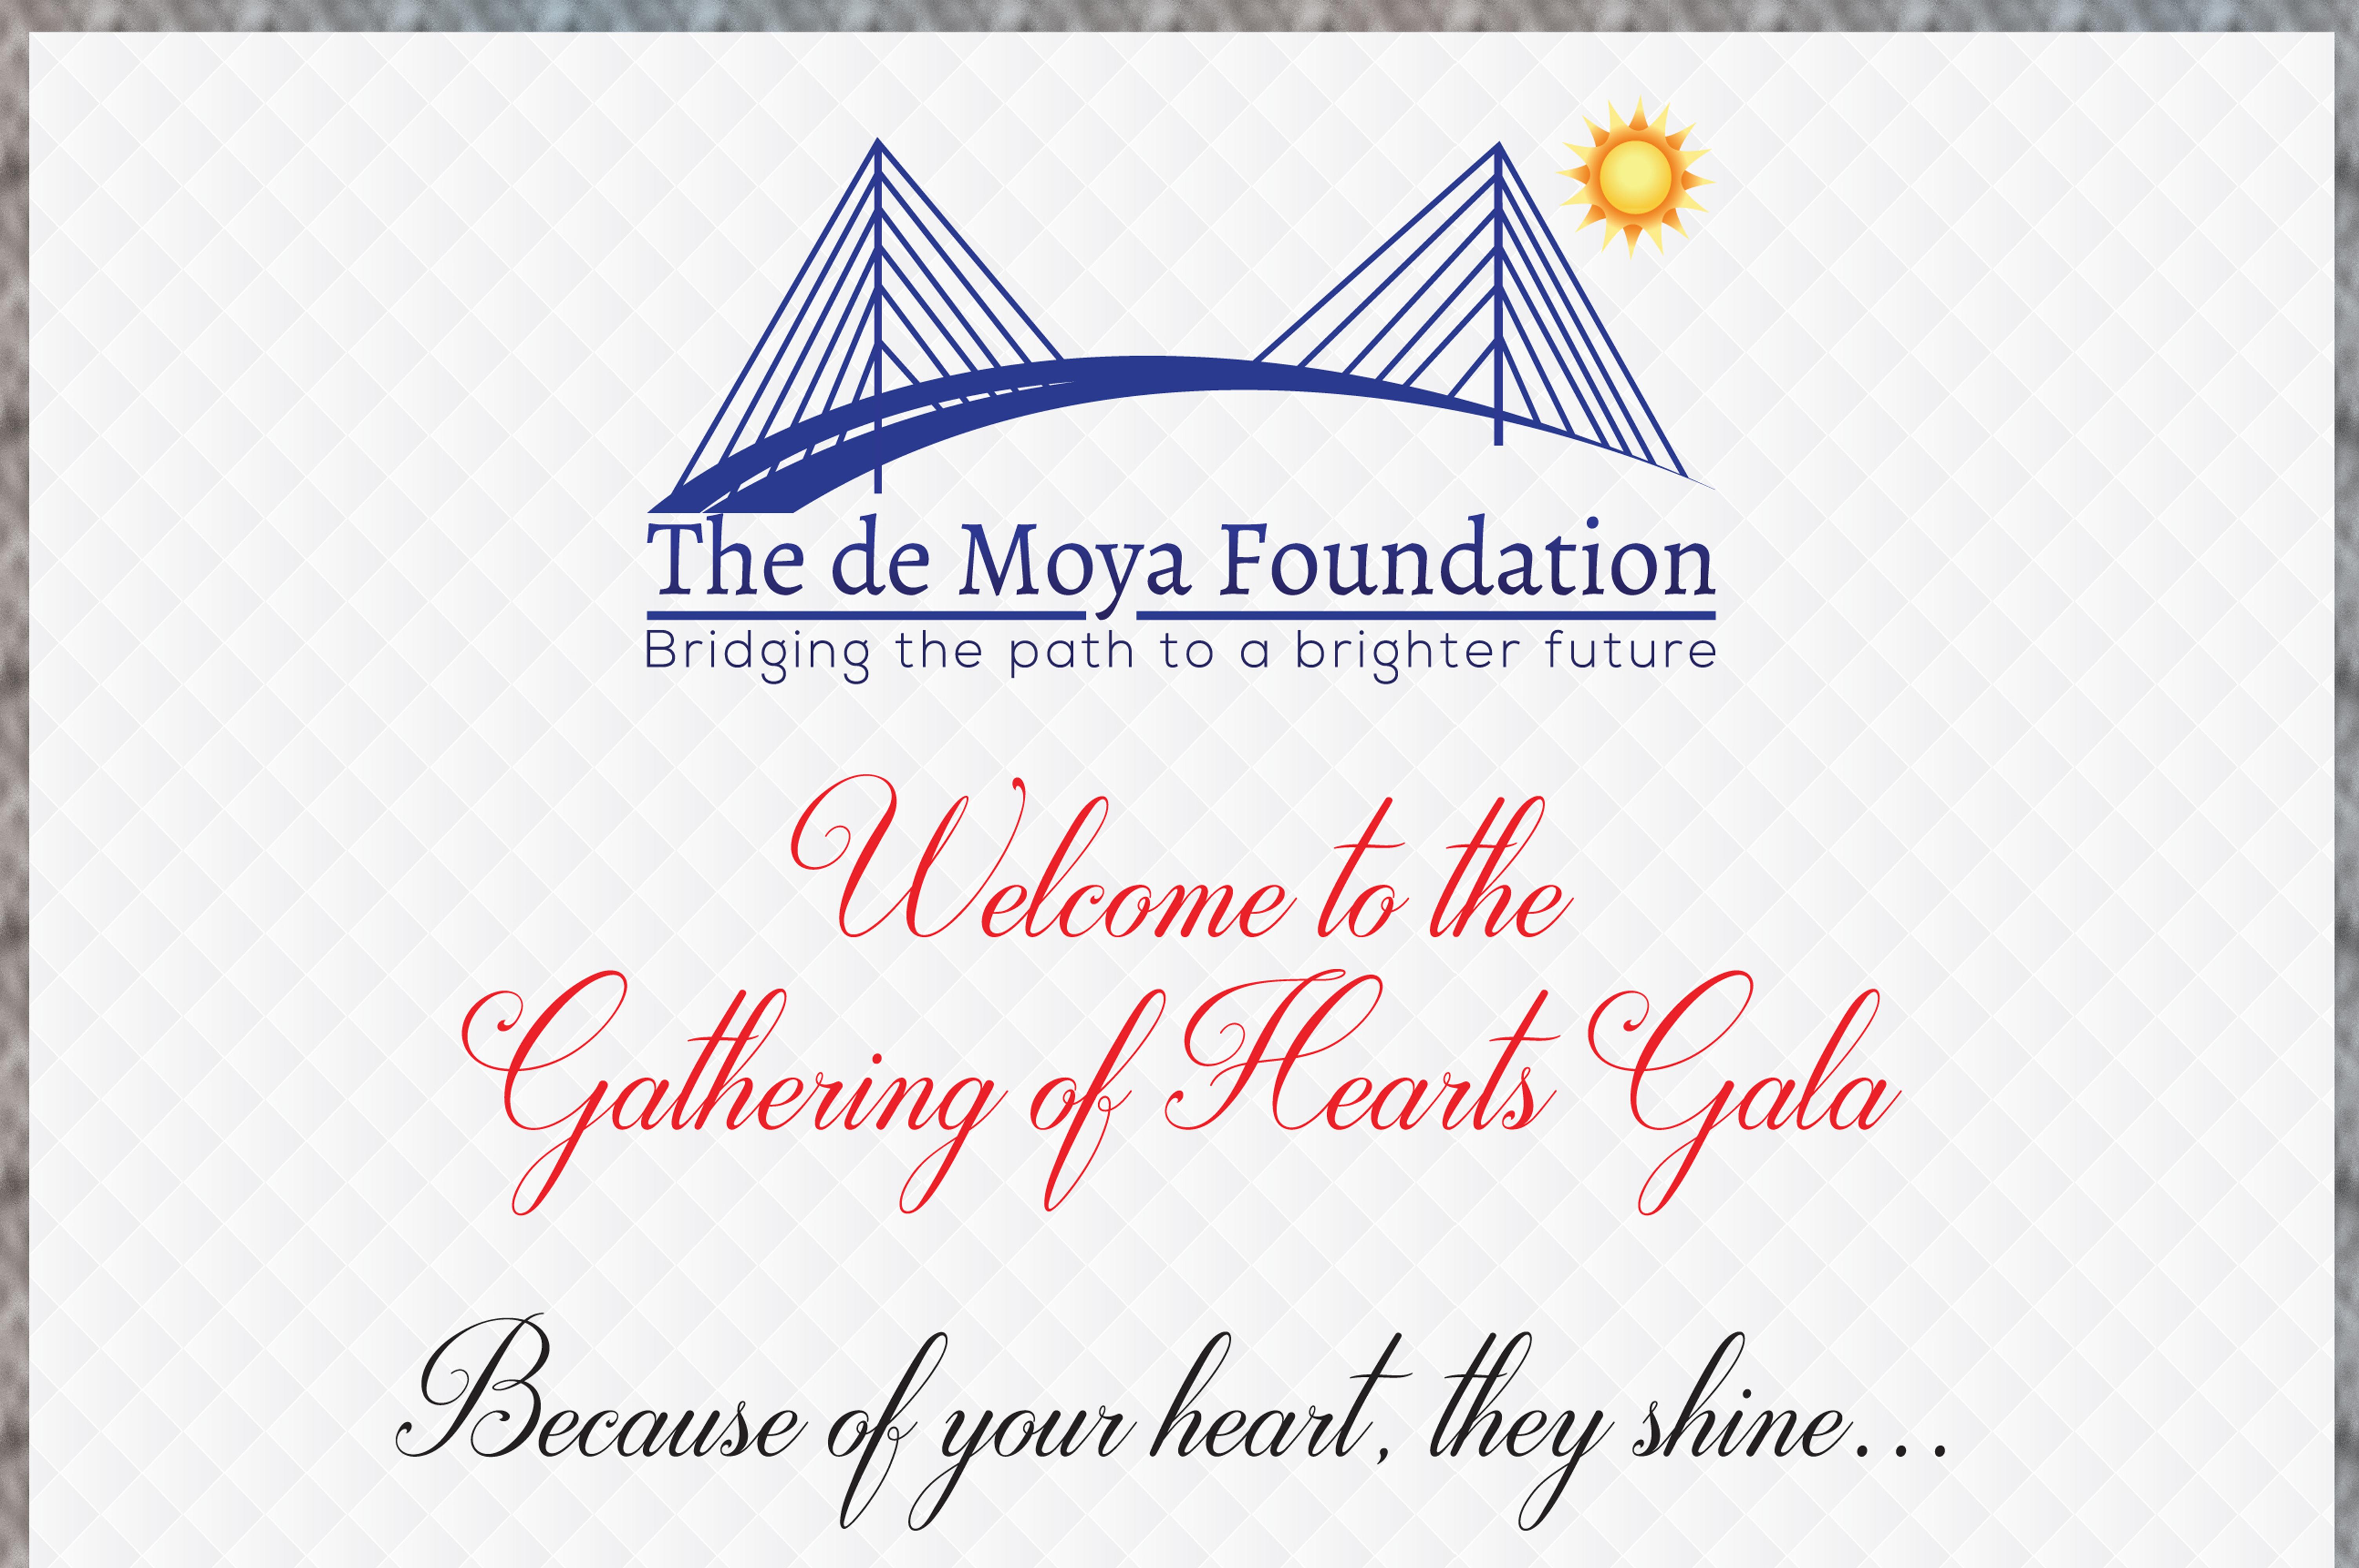 """Gathering of Hearts"" Gala | February 25, 2017"